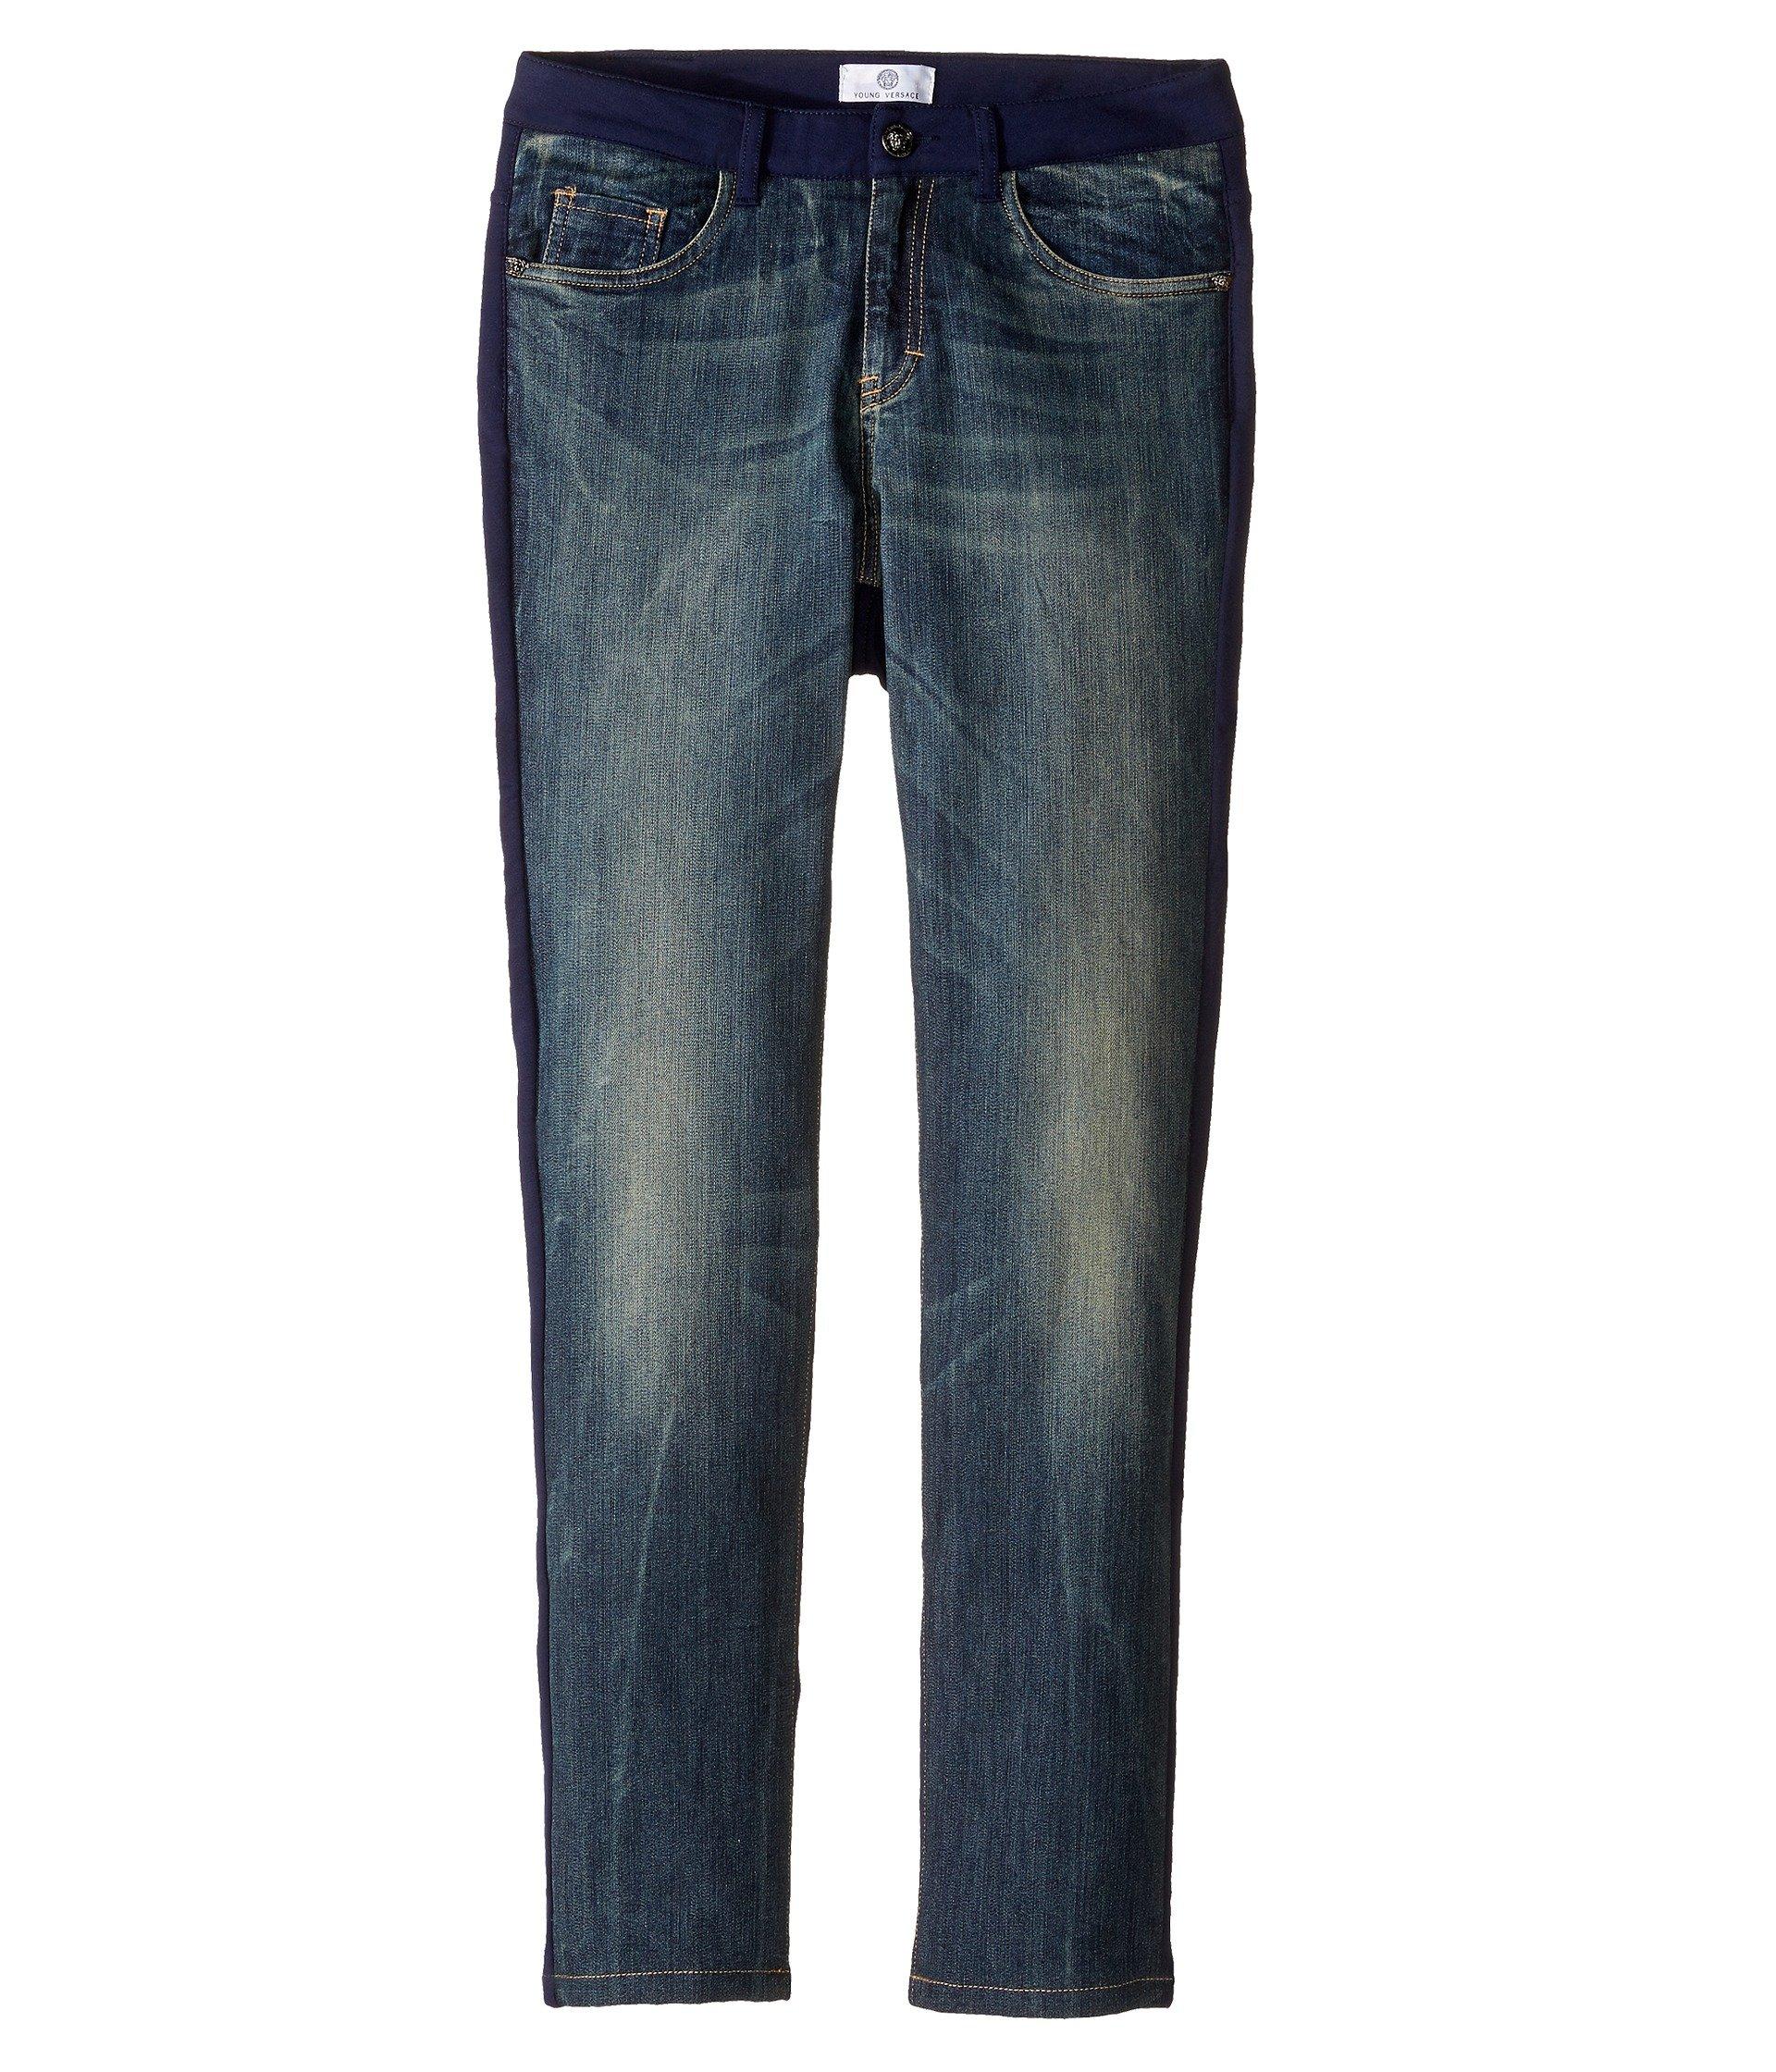 Versace Kids Boys' Denim and Sweat Mixed Fabric Pants (Big Kids), Denim Blue, 13/14 Years X One Size